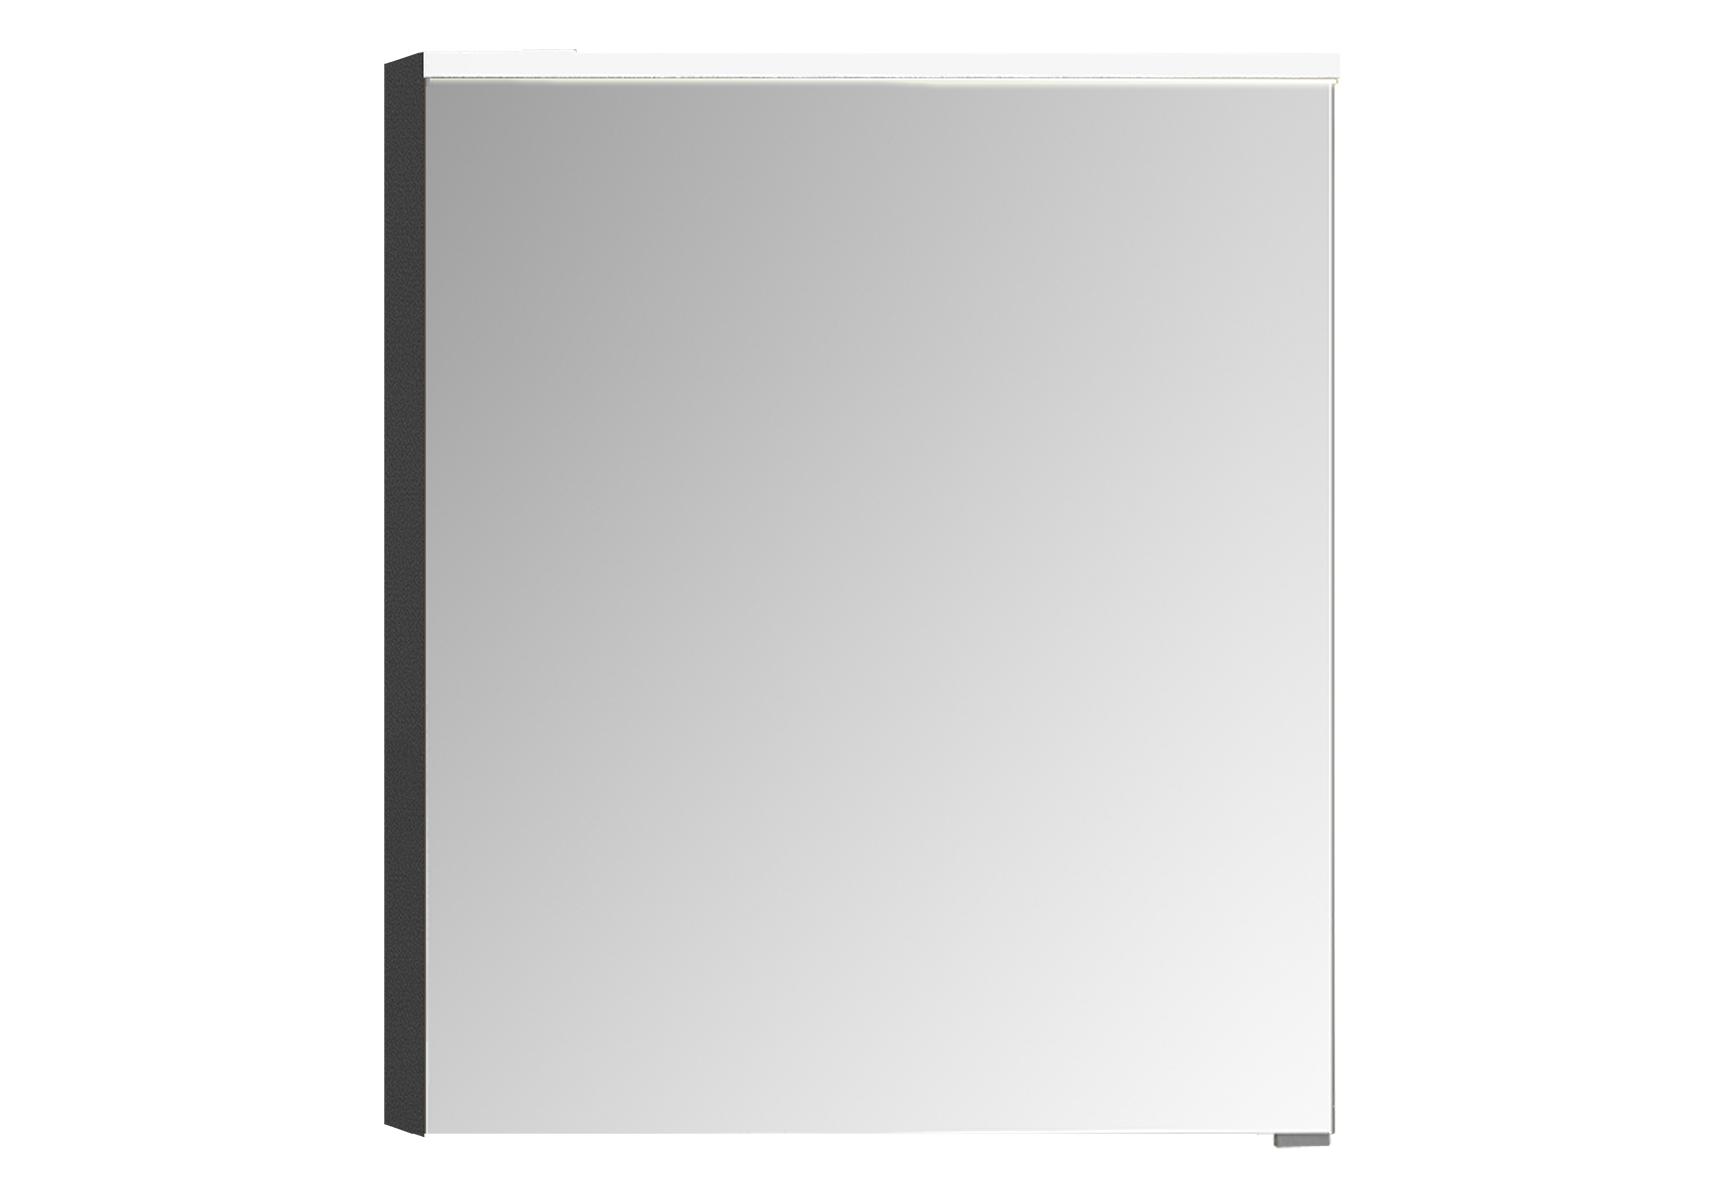 Integra Premium armoire de toilette, 60 cm, éclairage LED horizontale,anthraciteacite haute brilliance, gauche